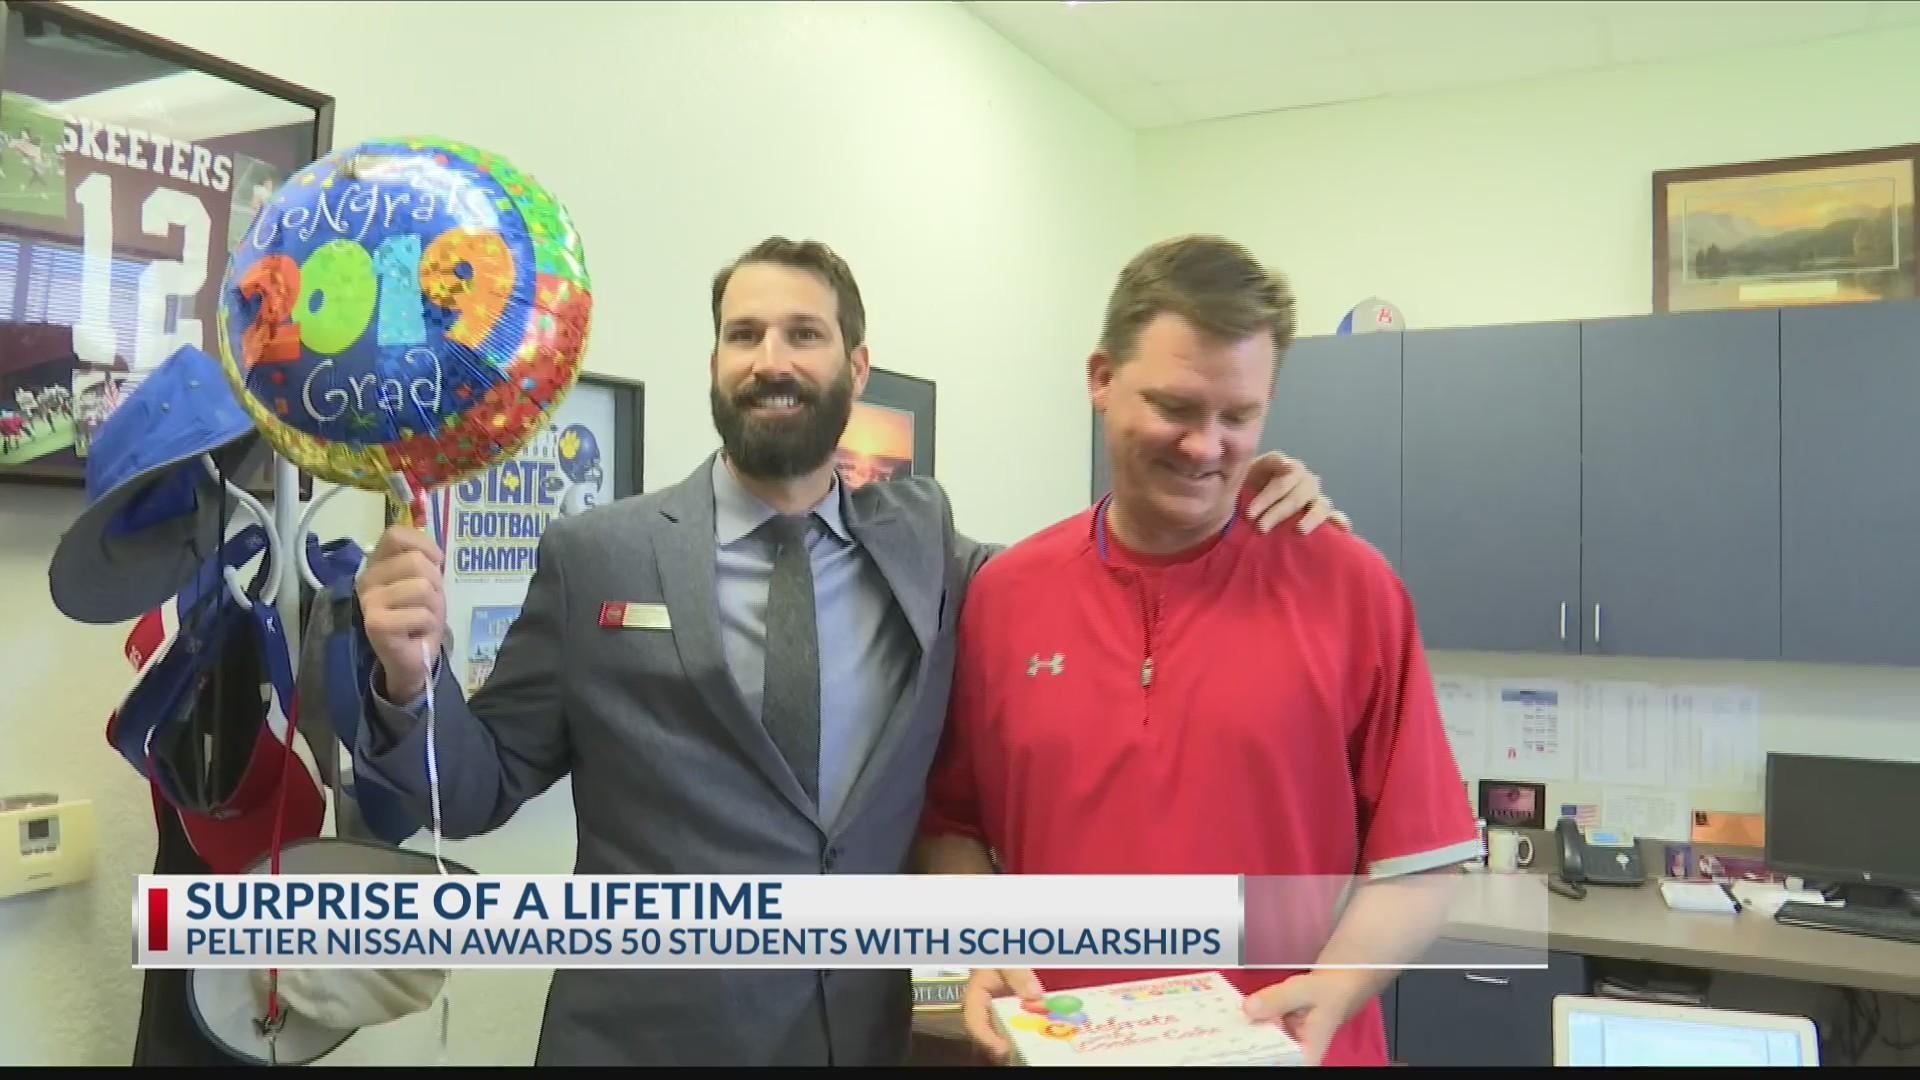 Peltier Tyler Tx >> Peltier Nissan Surprises East Texas Students With Scholarships